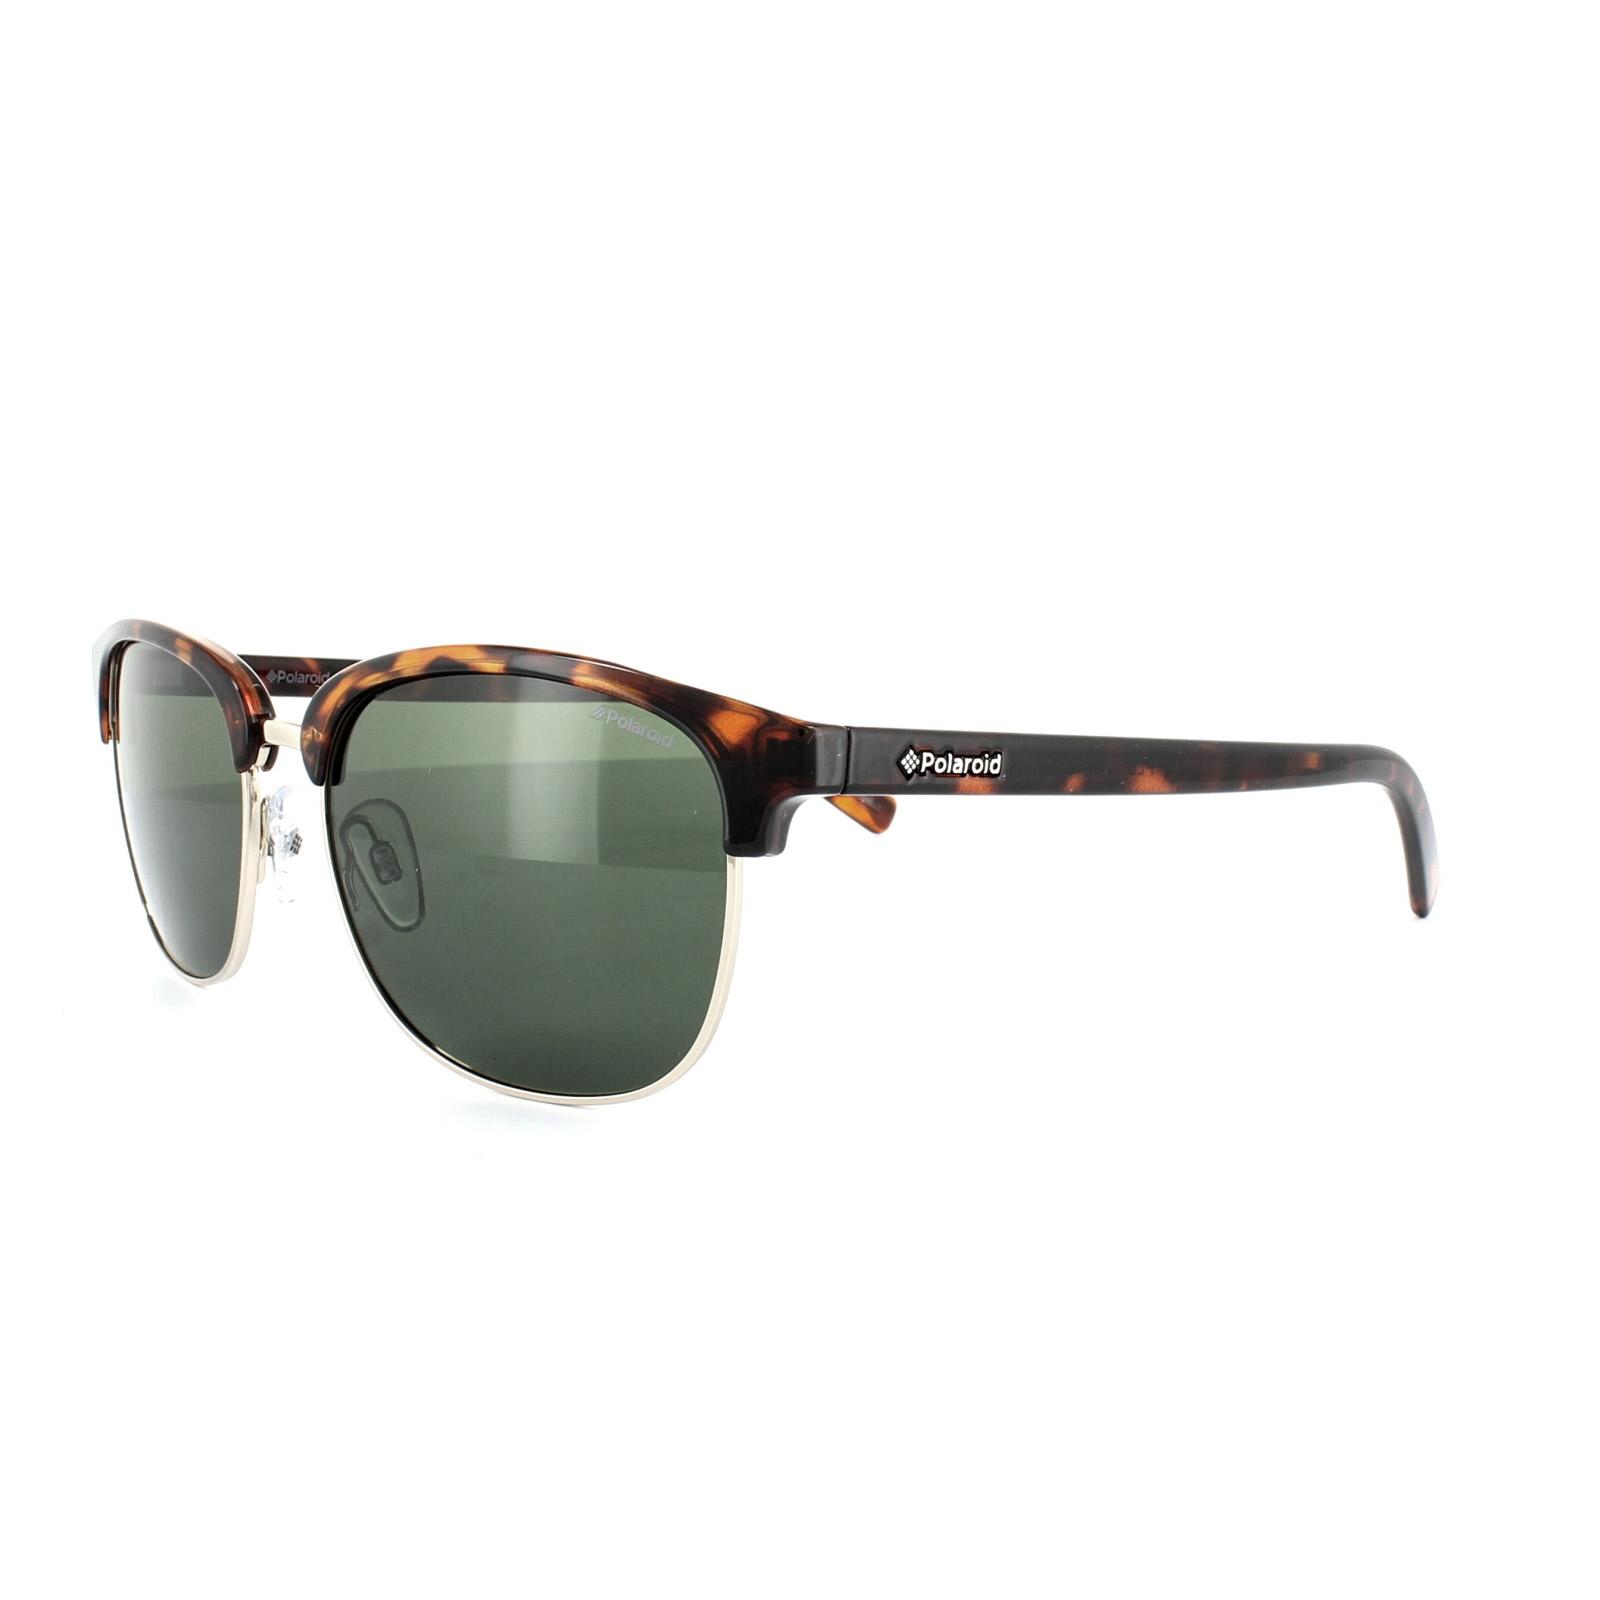 55575926685 Sentinel Polaroid Sunglasses 1012 S PR6 H8 Havana Green Polarized